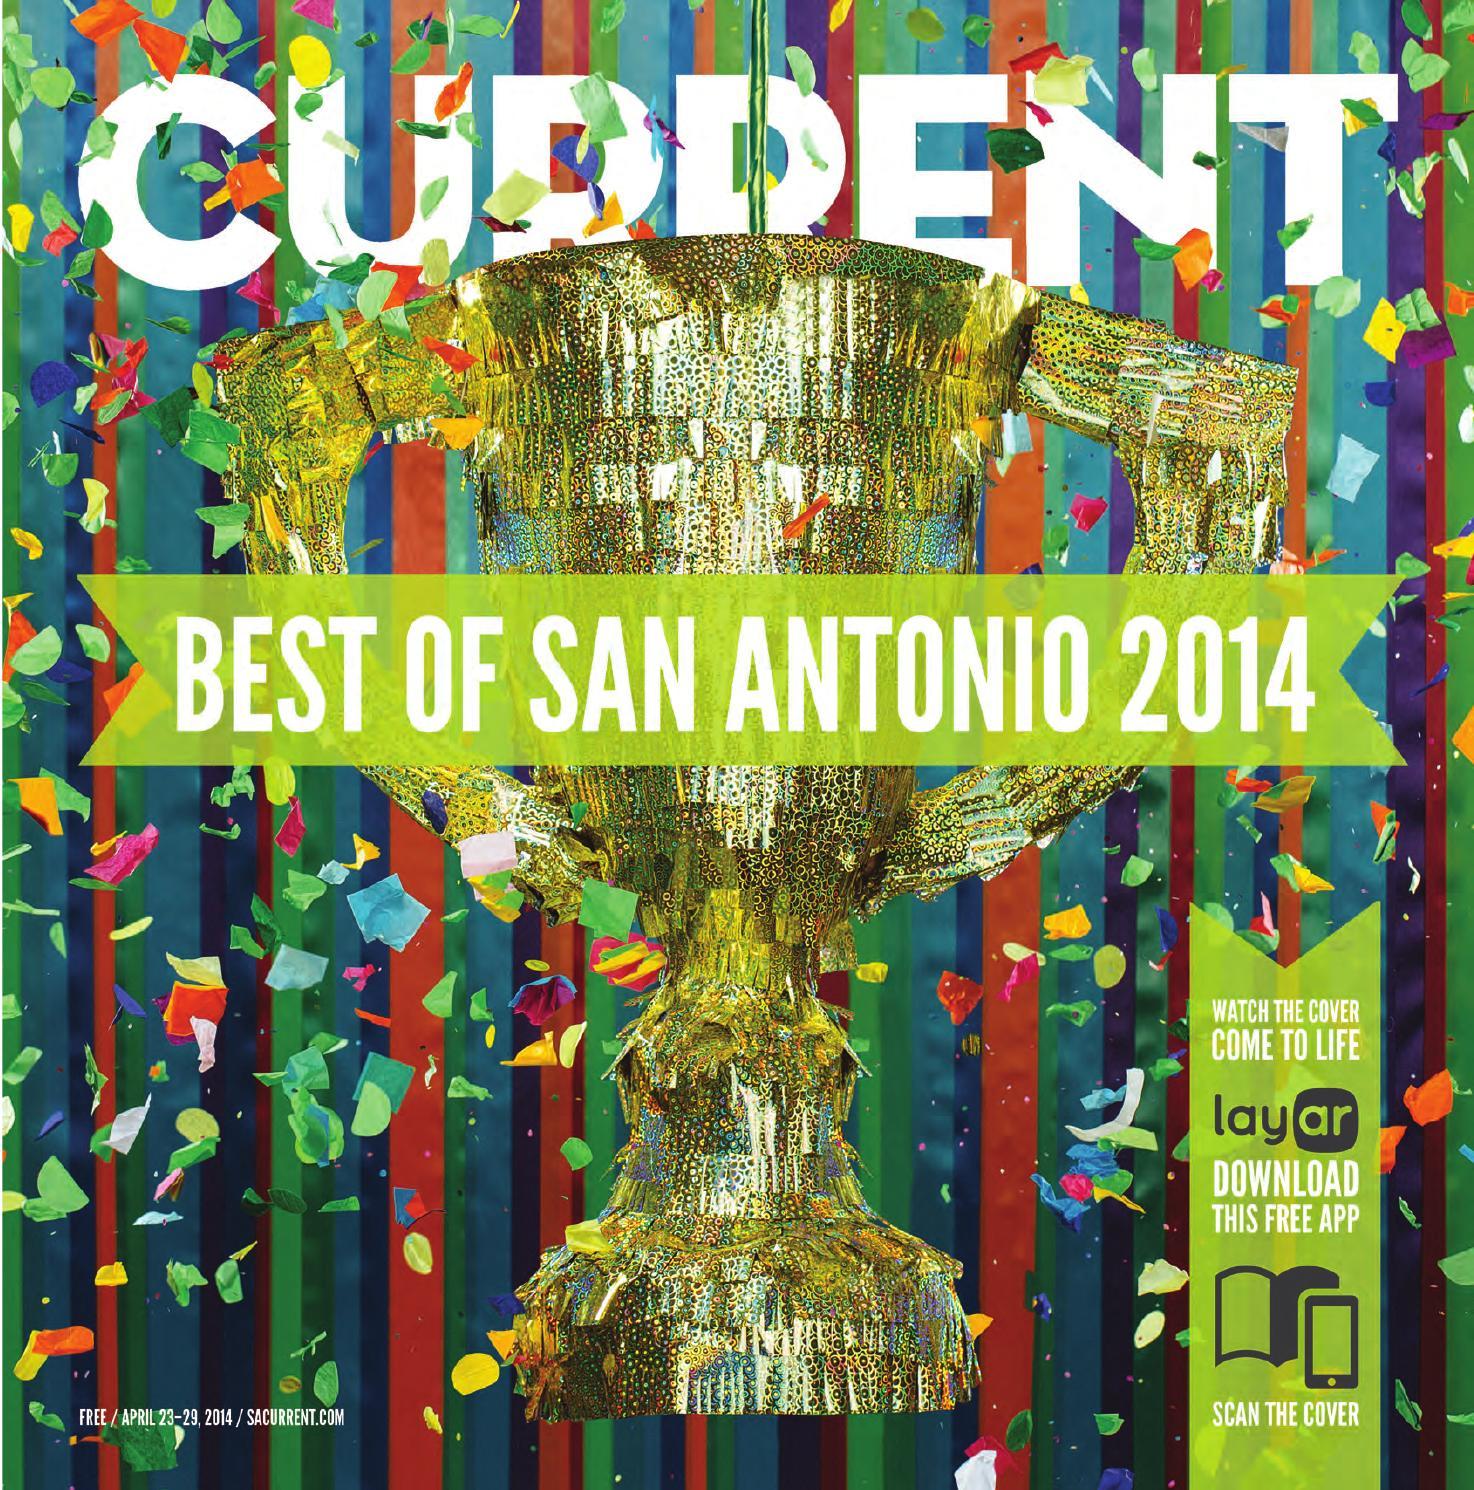 d264f1fe601 San antonio current best of san antonio 2014 by Euclid Media Group ...